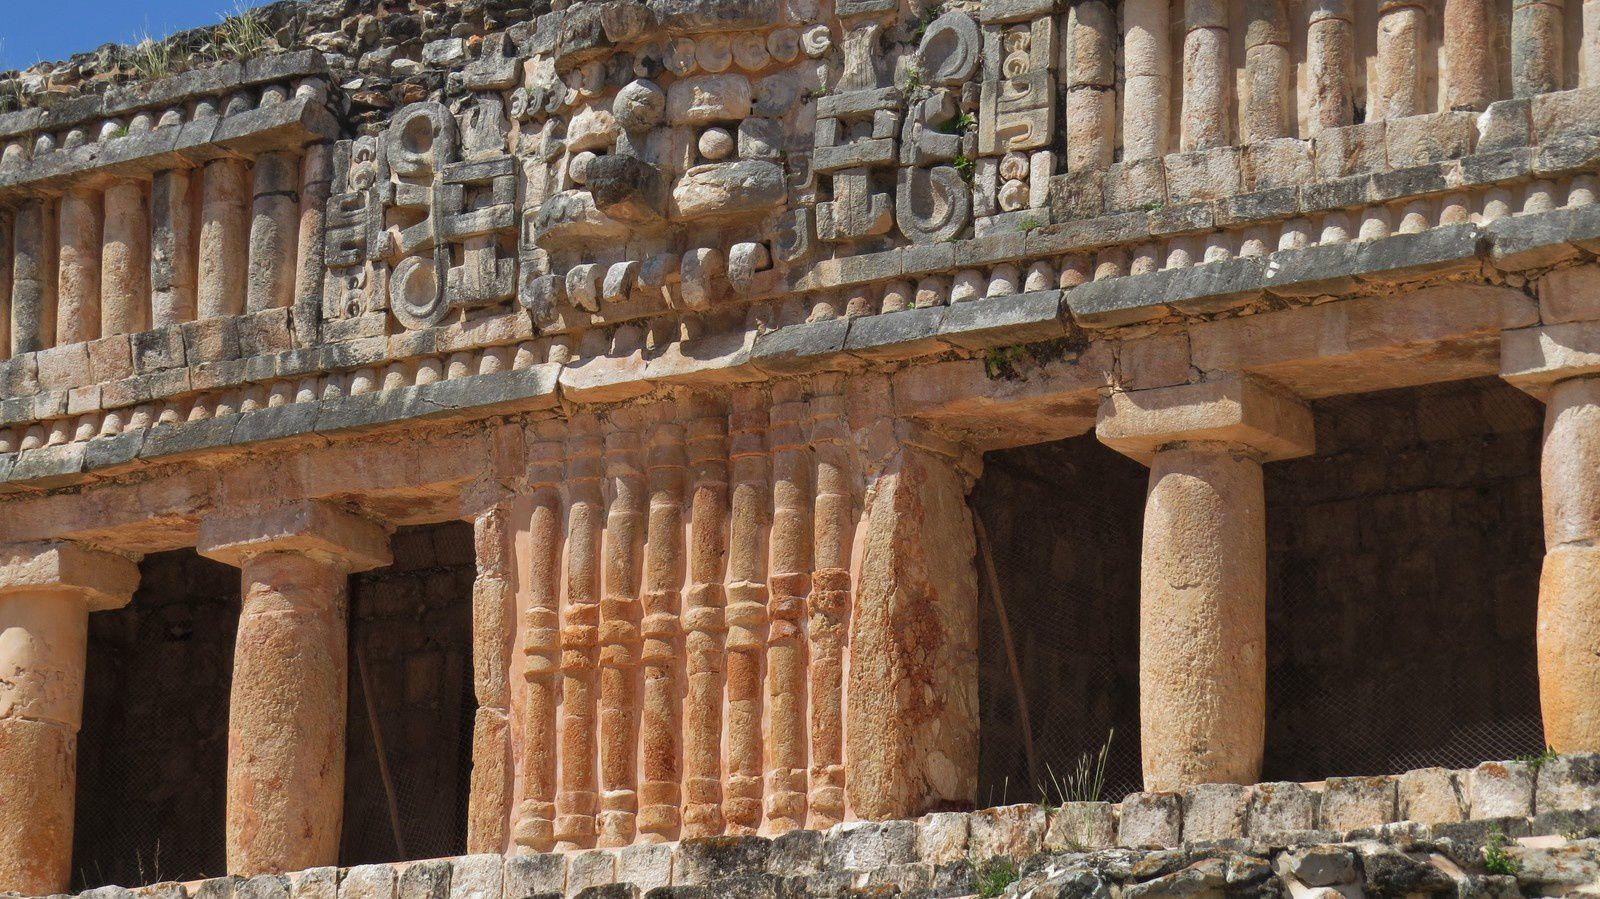 TRANSAMERICA (2.4.- Chiapas, Yucatàn)